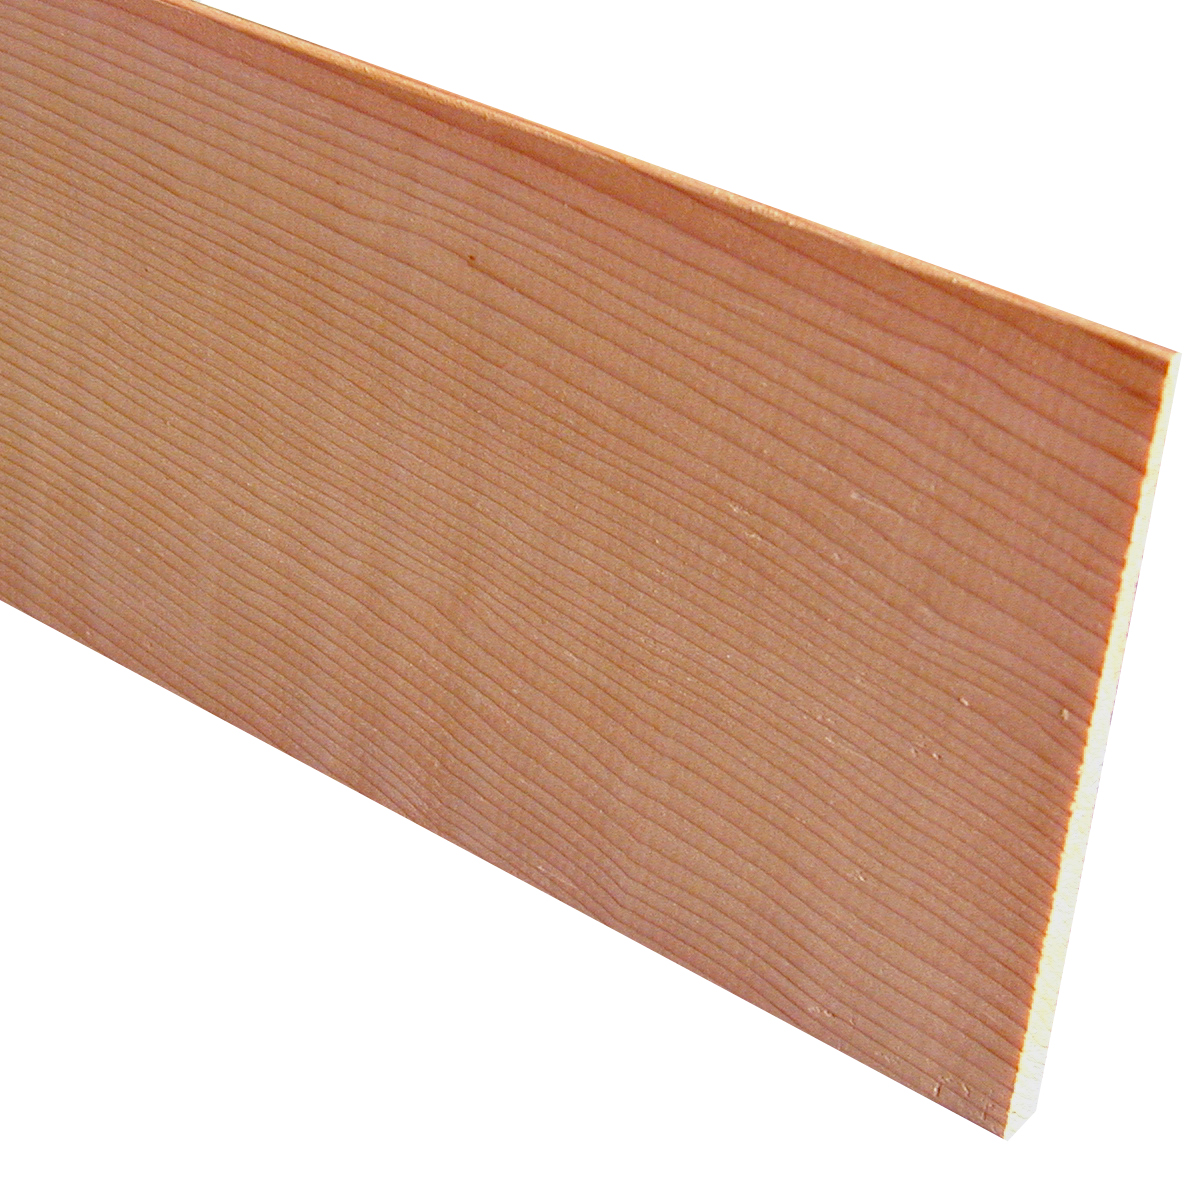 Clapboard Clear Vg Western Red Cedar